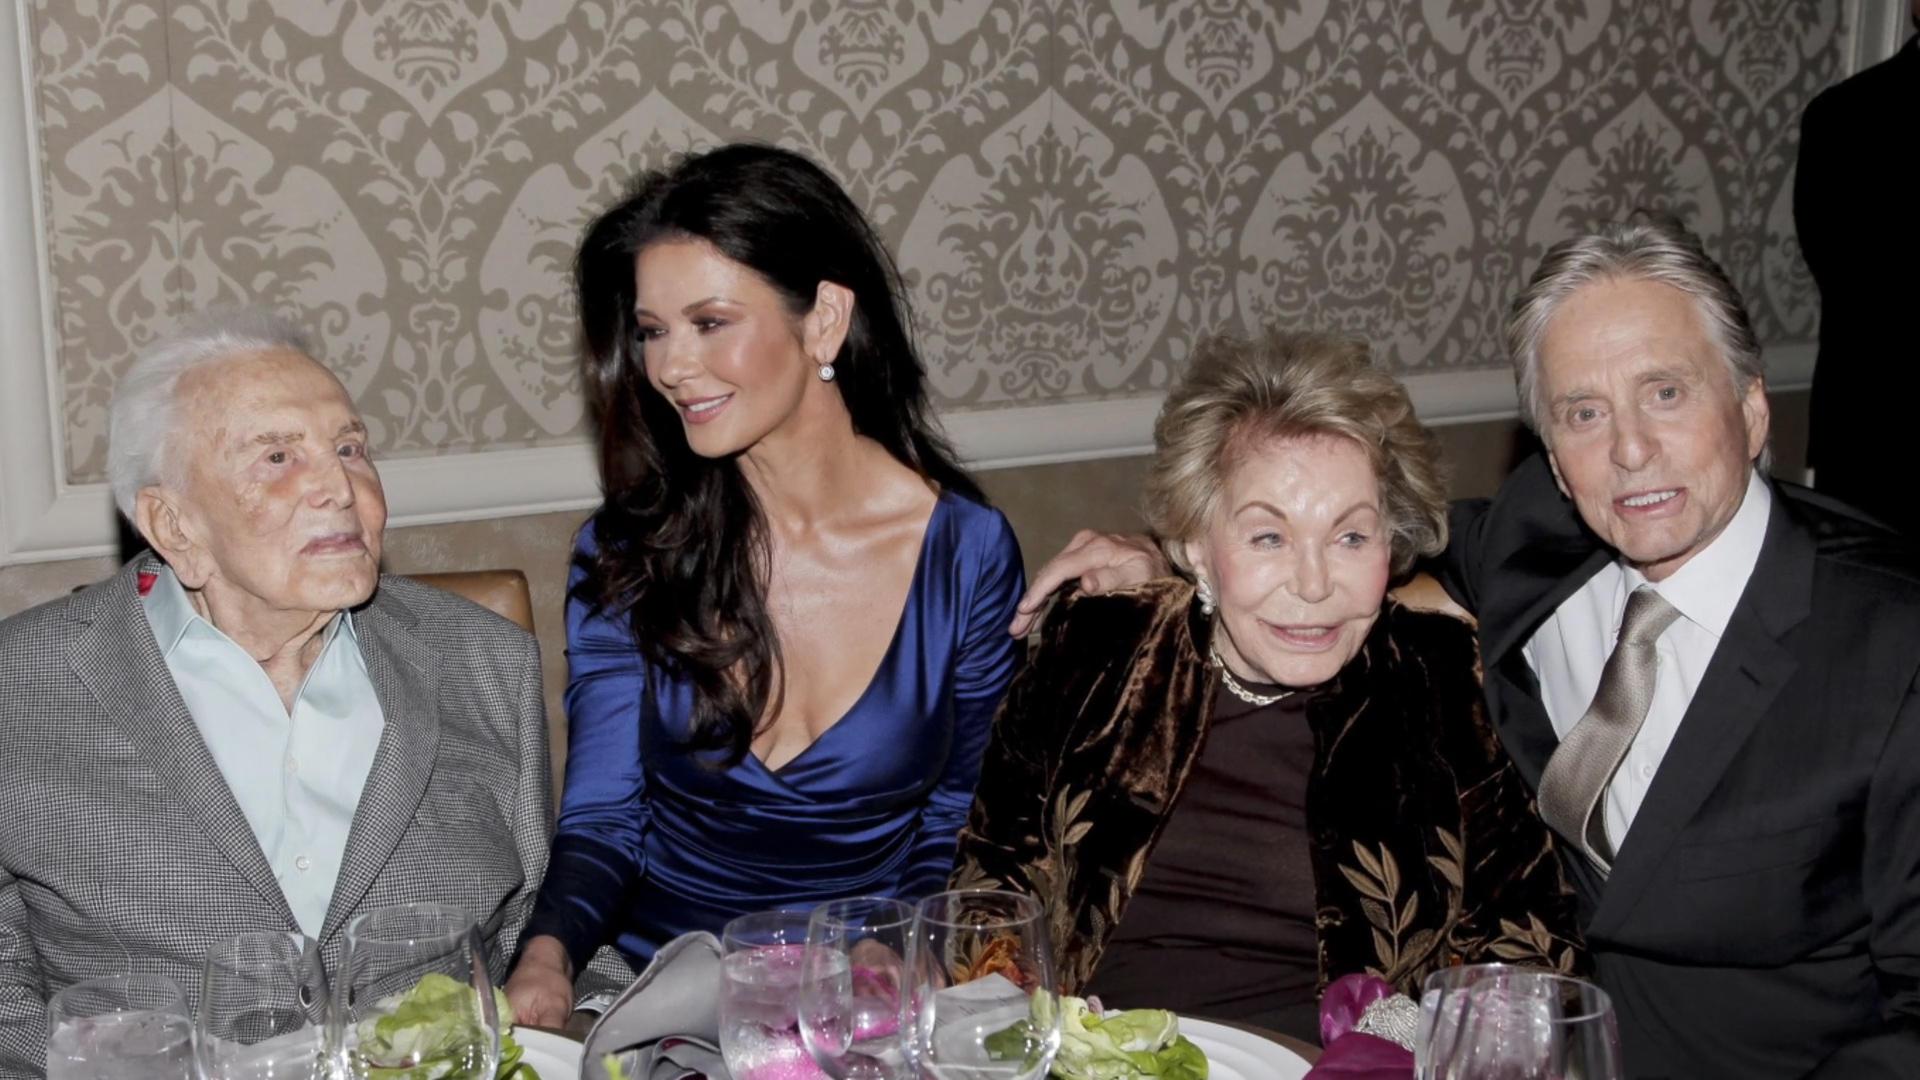 Michael Douglas and Catherine Zeta-Jones remember 'one of a kind' Kirk Douglas